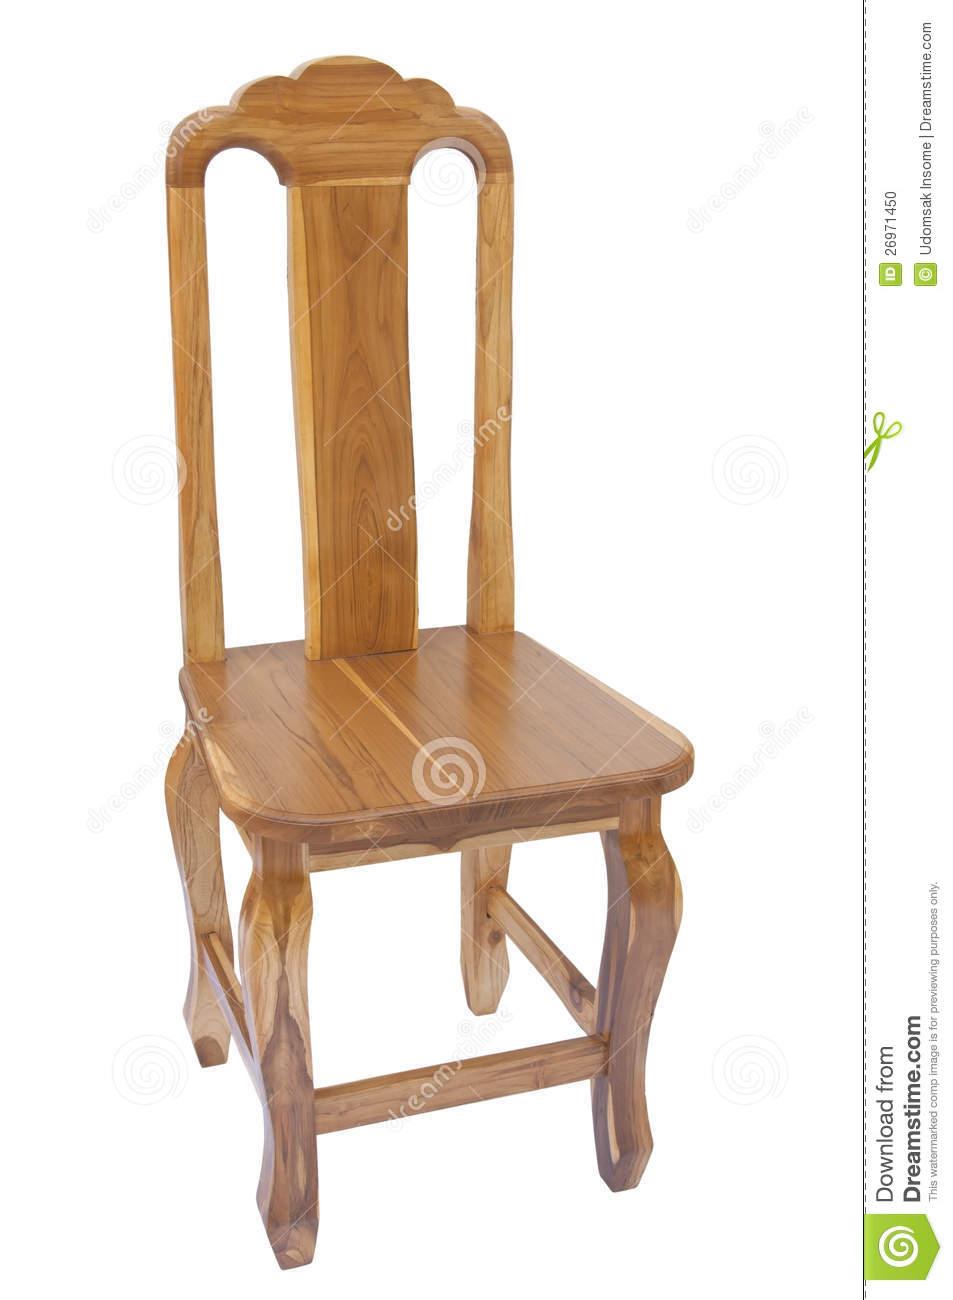 Teak Wooden Chair Stock Photo.